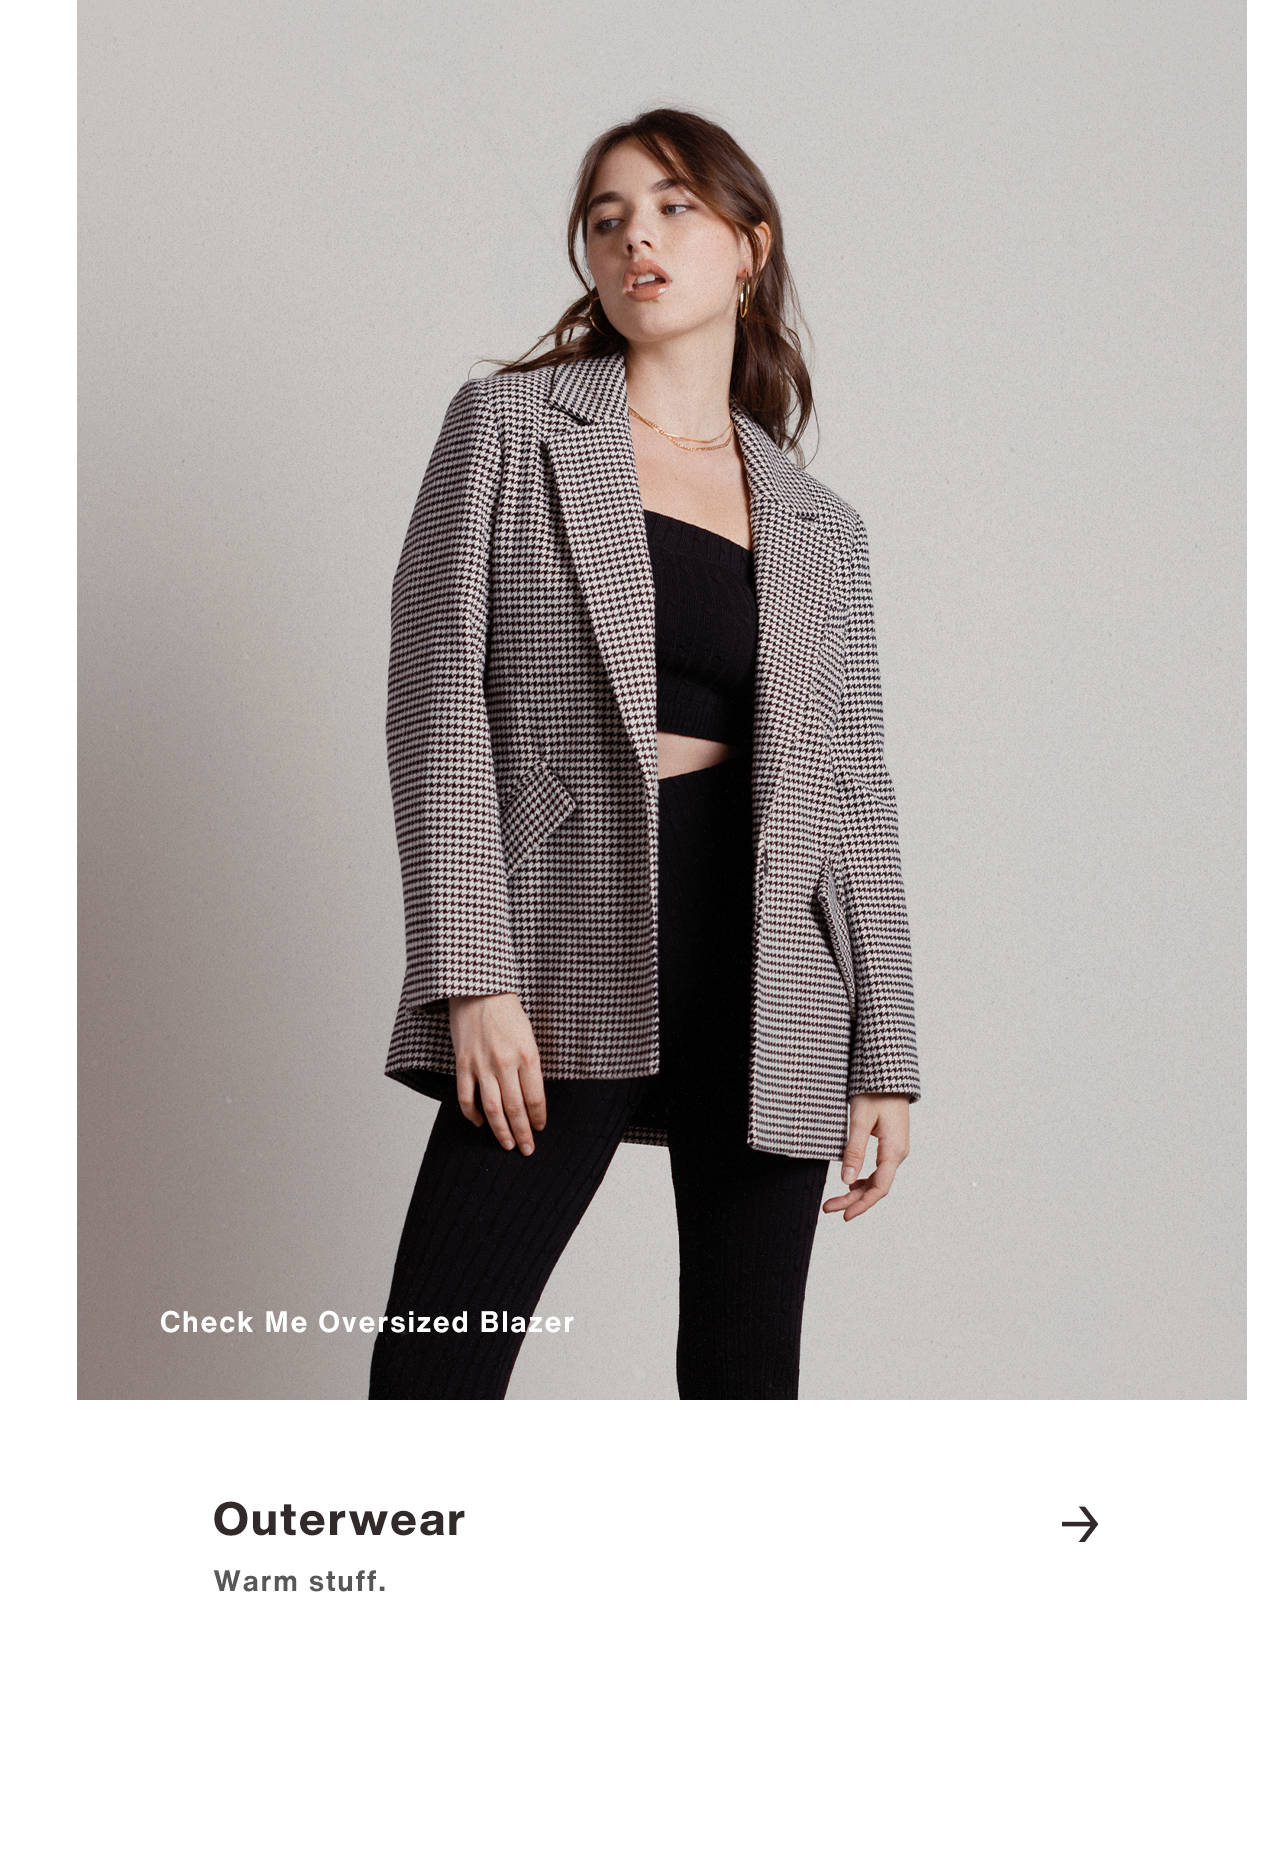 Outerwear - Warm stuff.